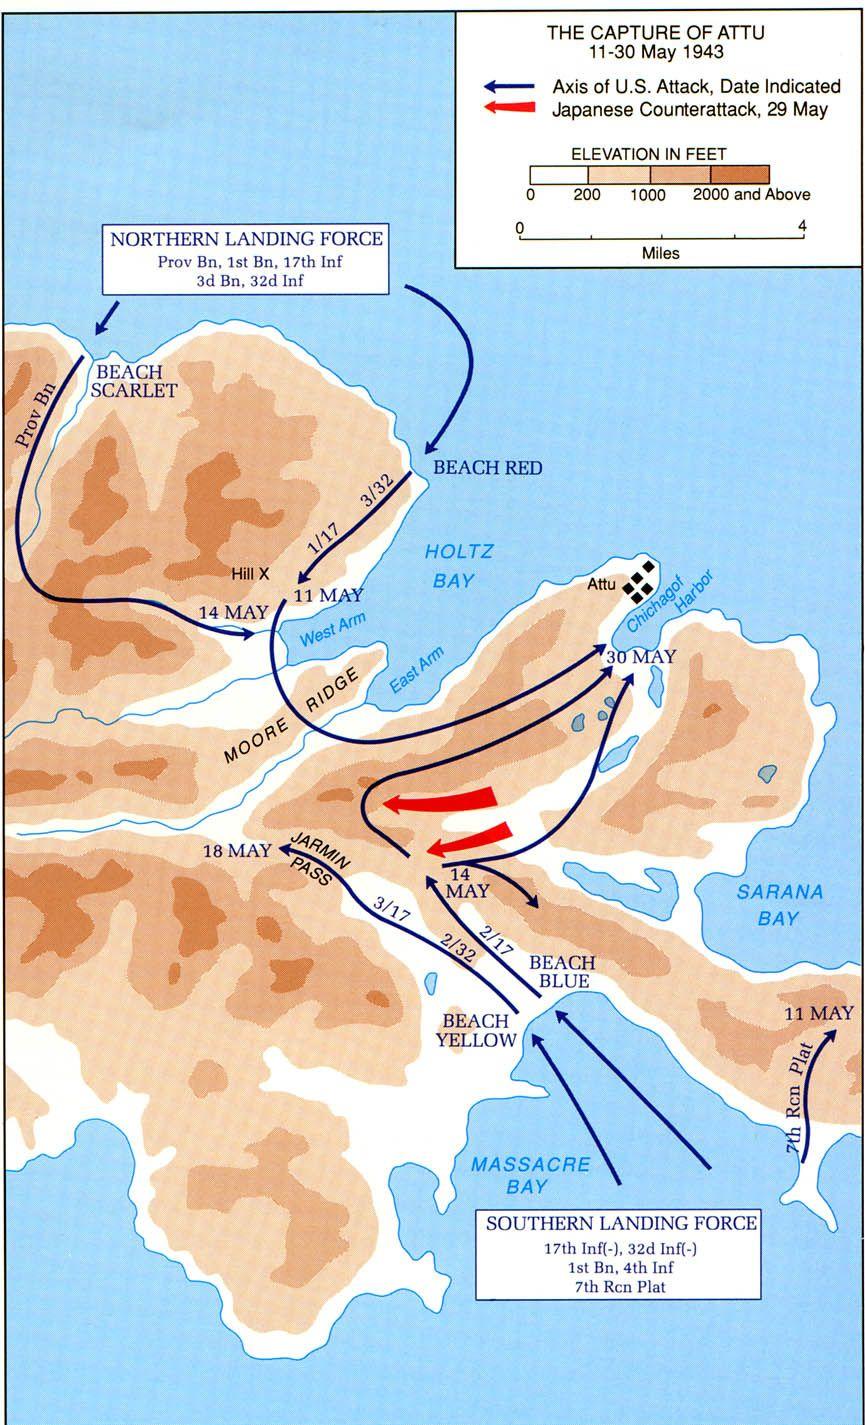 map of the capture of attu in the aleutian islands 1943 [ 865 x 1425 Pixel ]